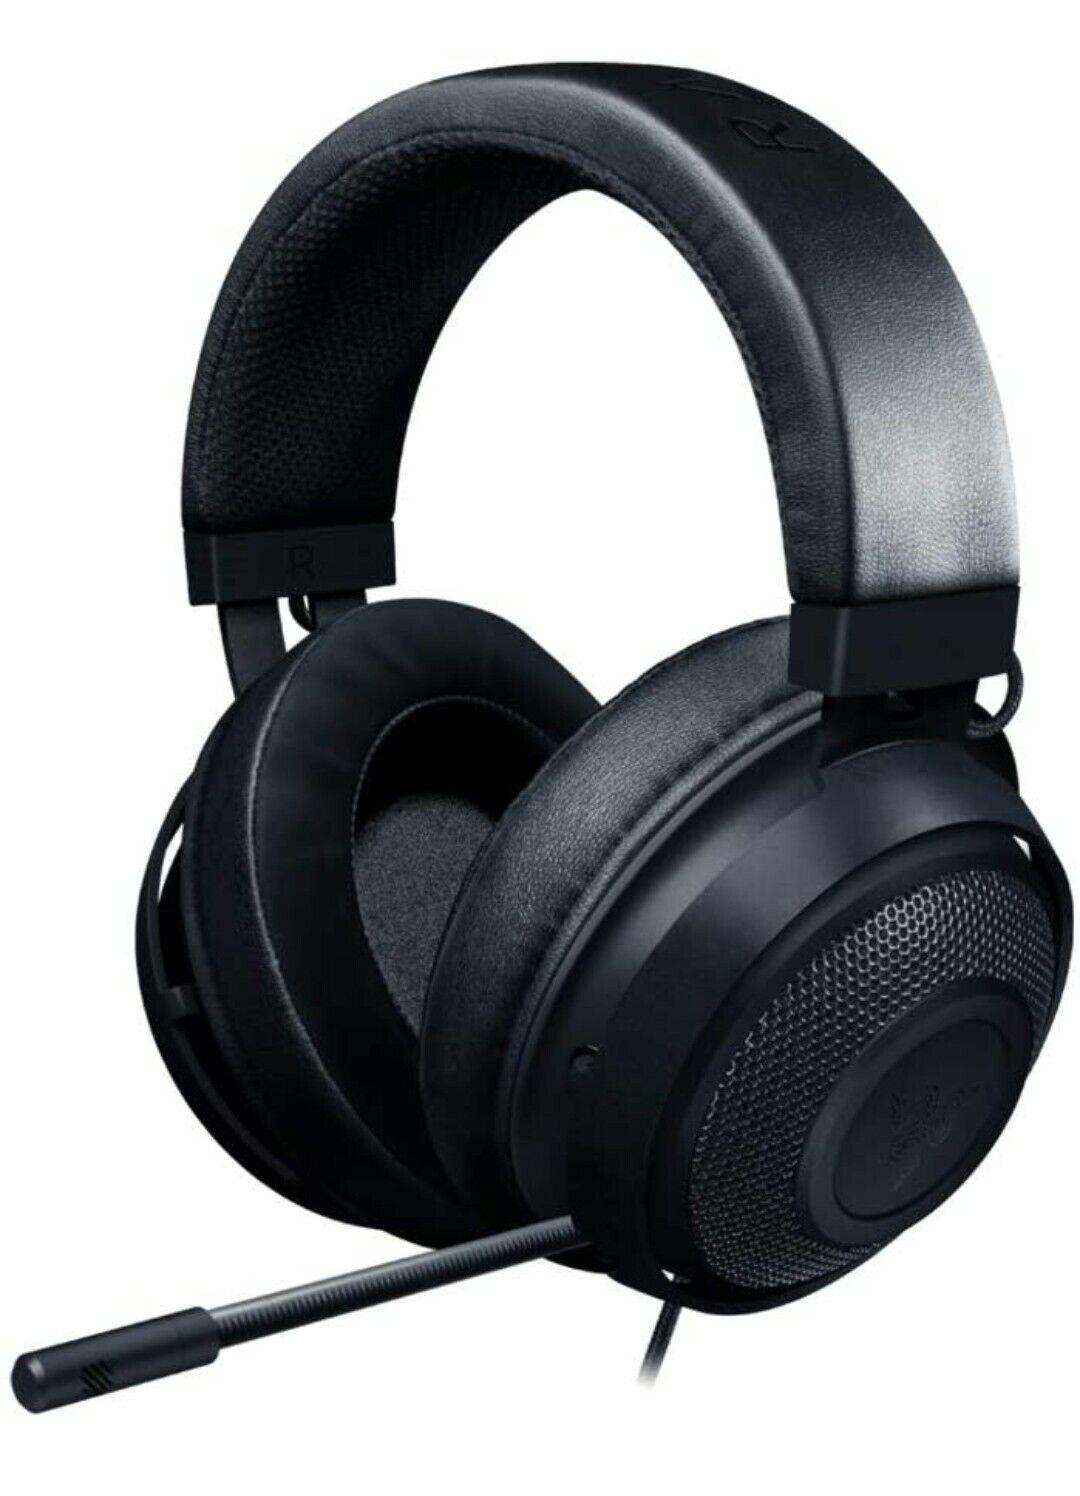 Razer Kraken Competitive Gaming Headset - Noise Cancelling Microphone - Black